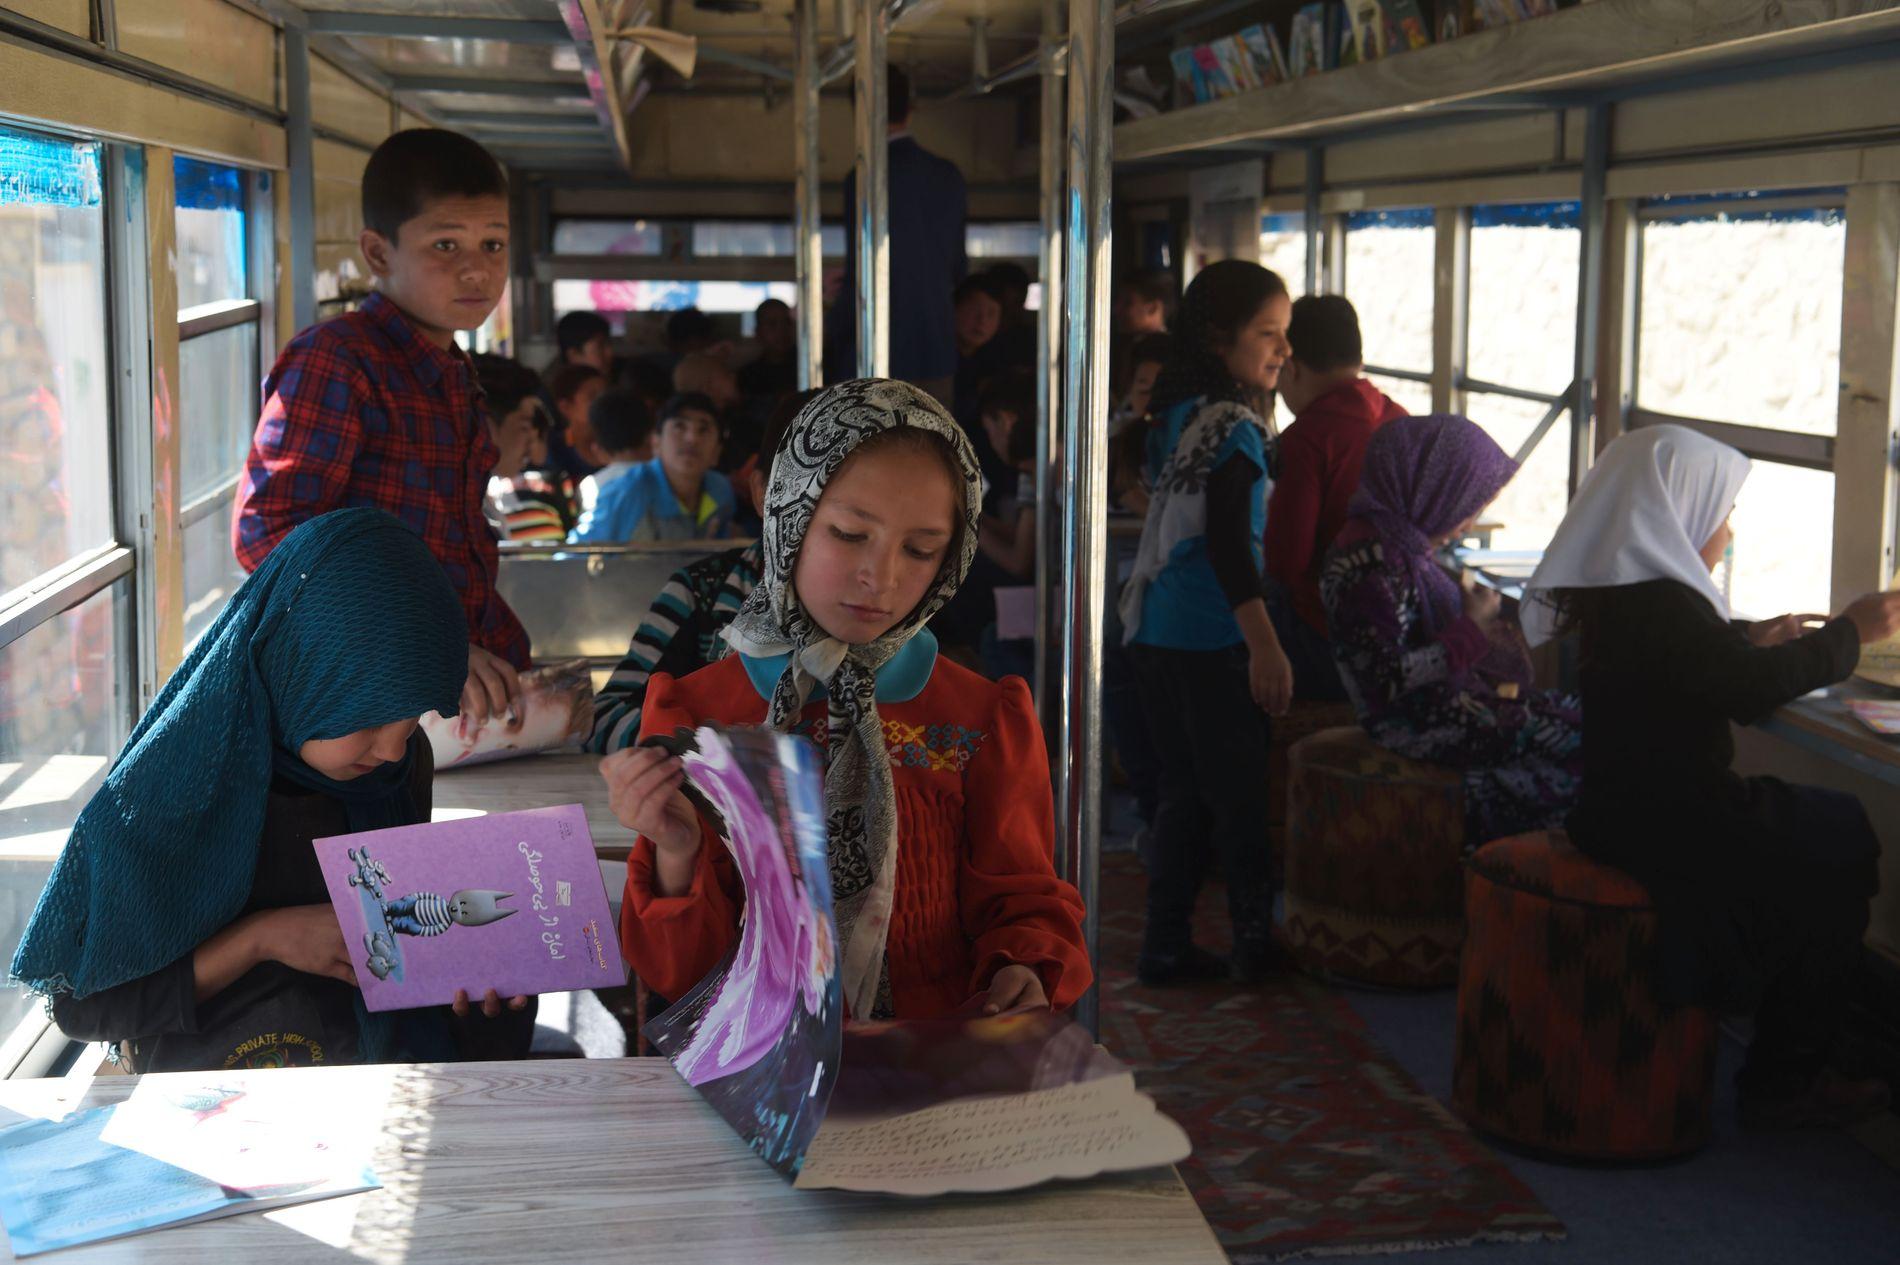 SKOLE: I denne bussen omgjort til et bibliotek i Afghanistan, får skolebarn gratis tilgang på bøker.